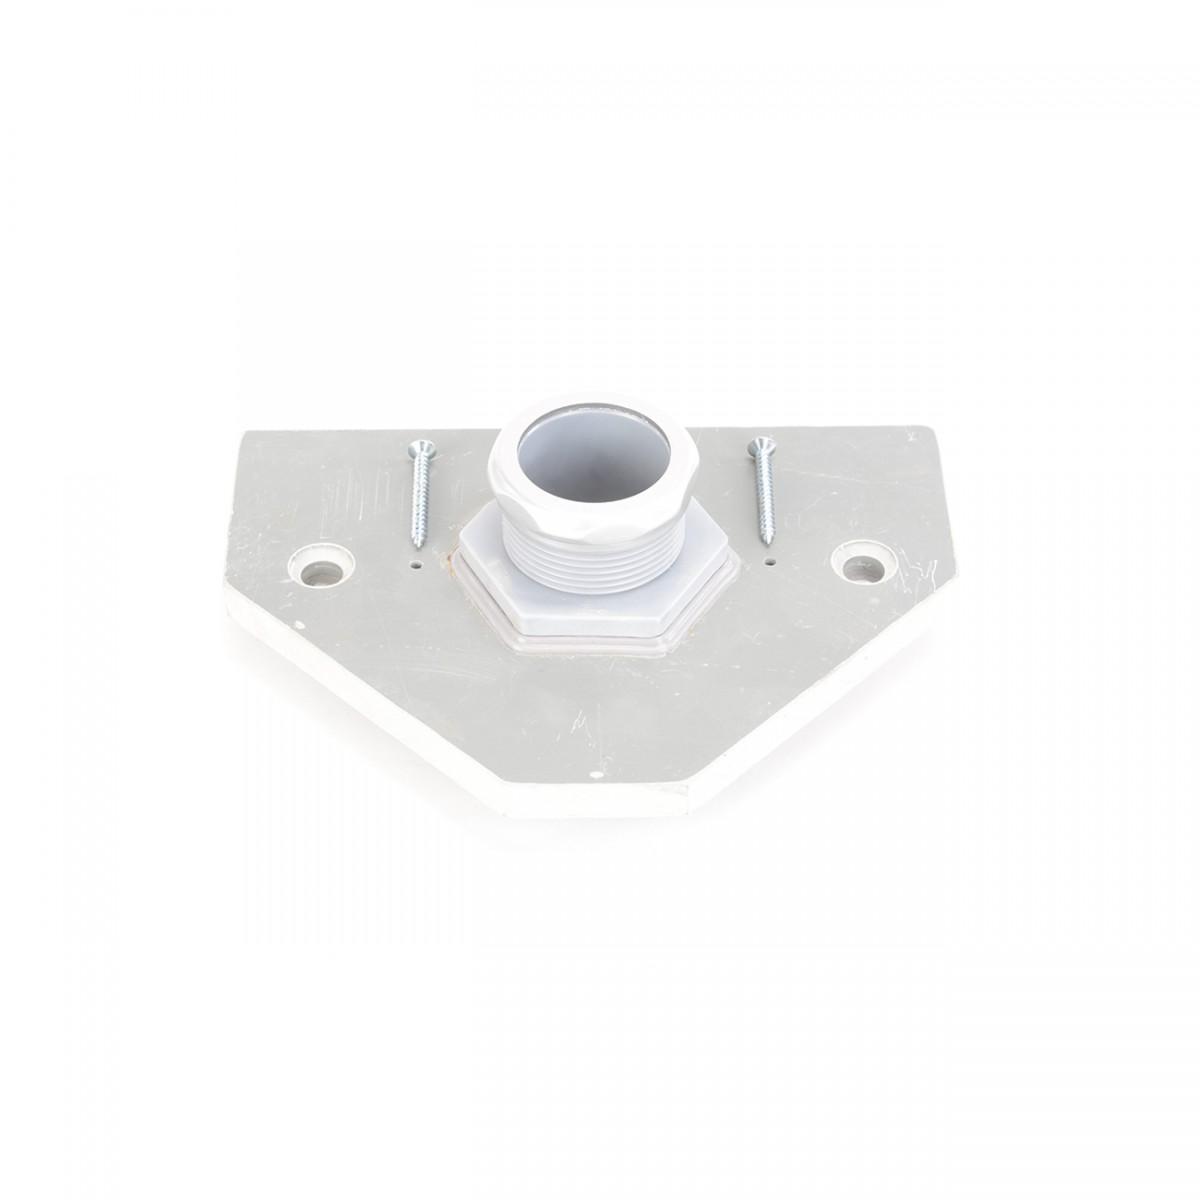 Toilet Plastic Conversion Panel High Tank Plastic Conversion Panel High Tank Toilet Parts